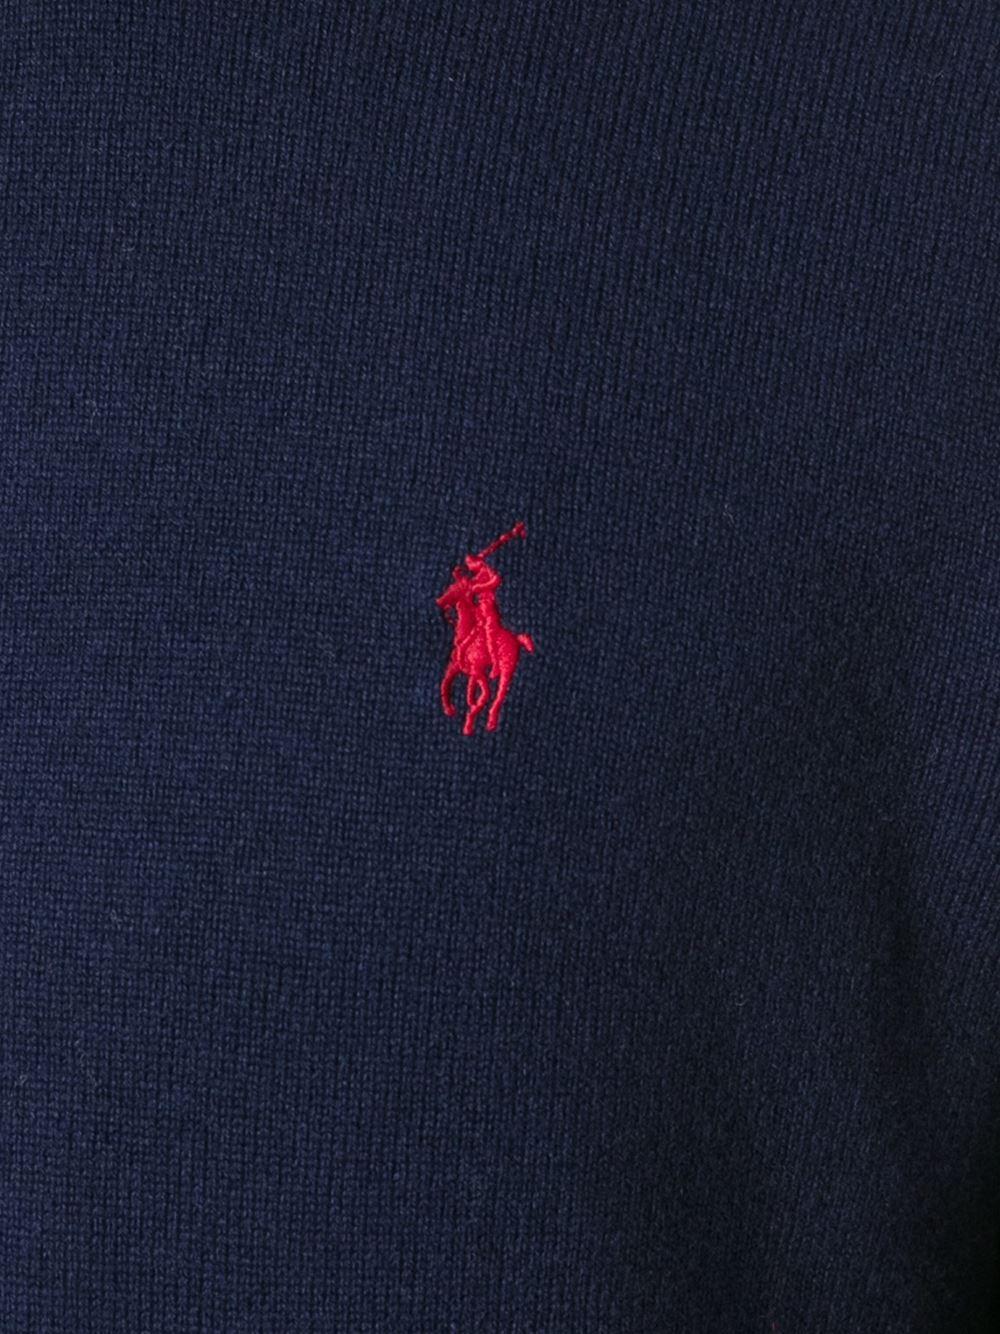 lyst polo ralph lauren logo sweater in blue for men